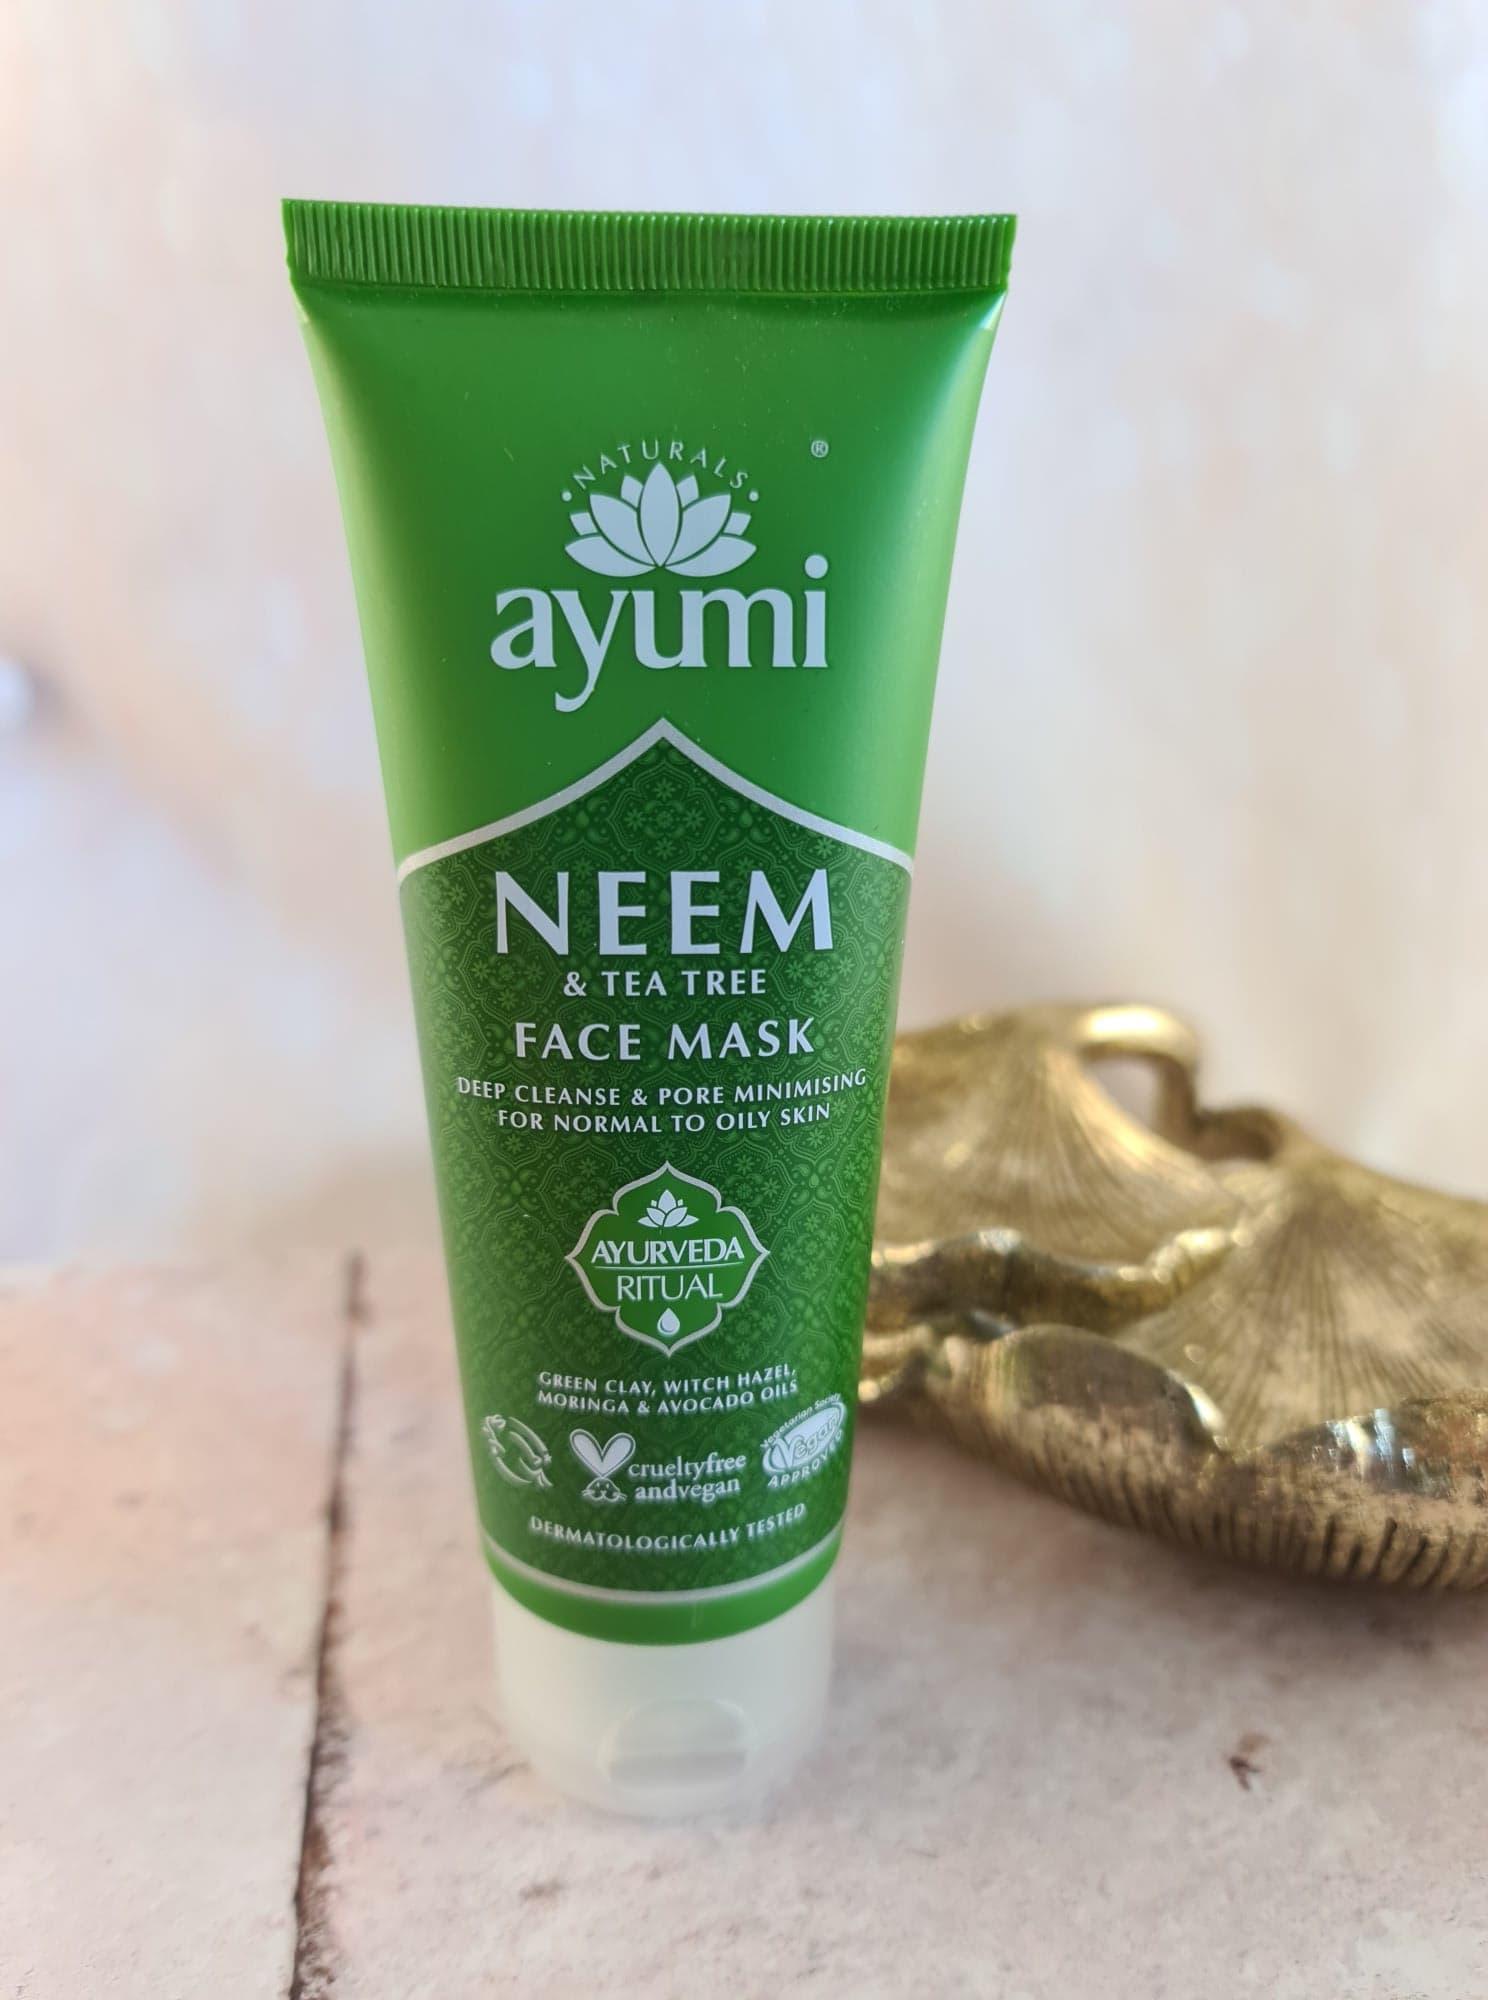 Ayumi Neem & Tea Tree Face Mask